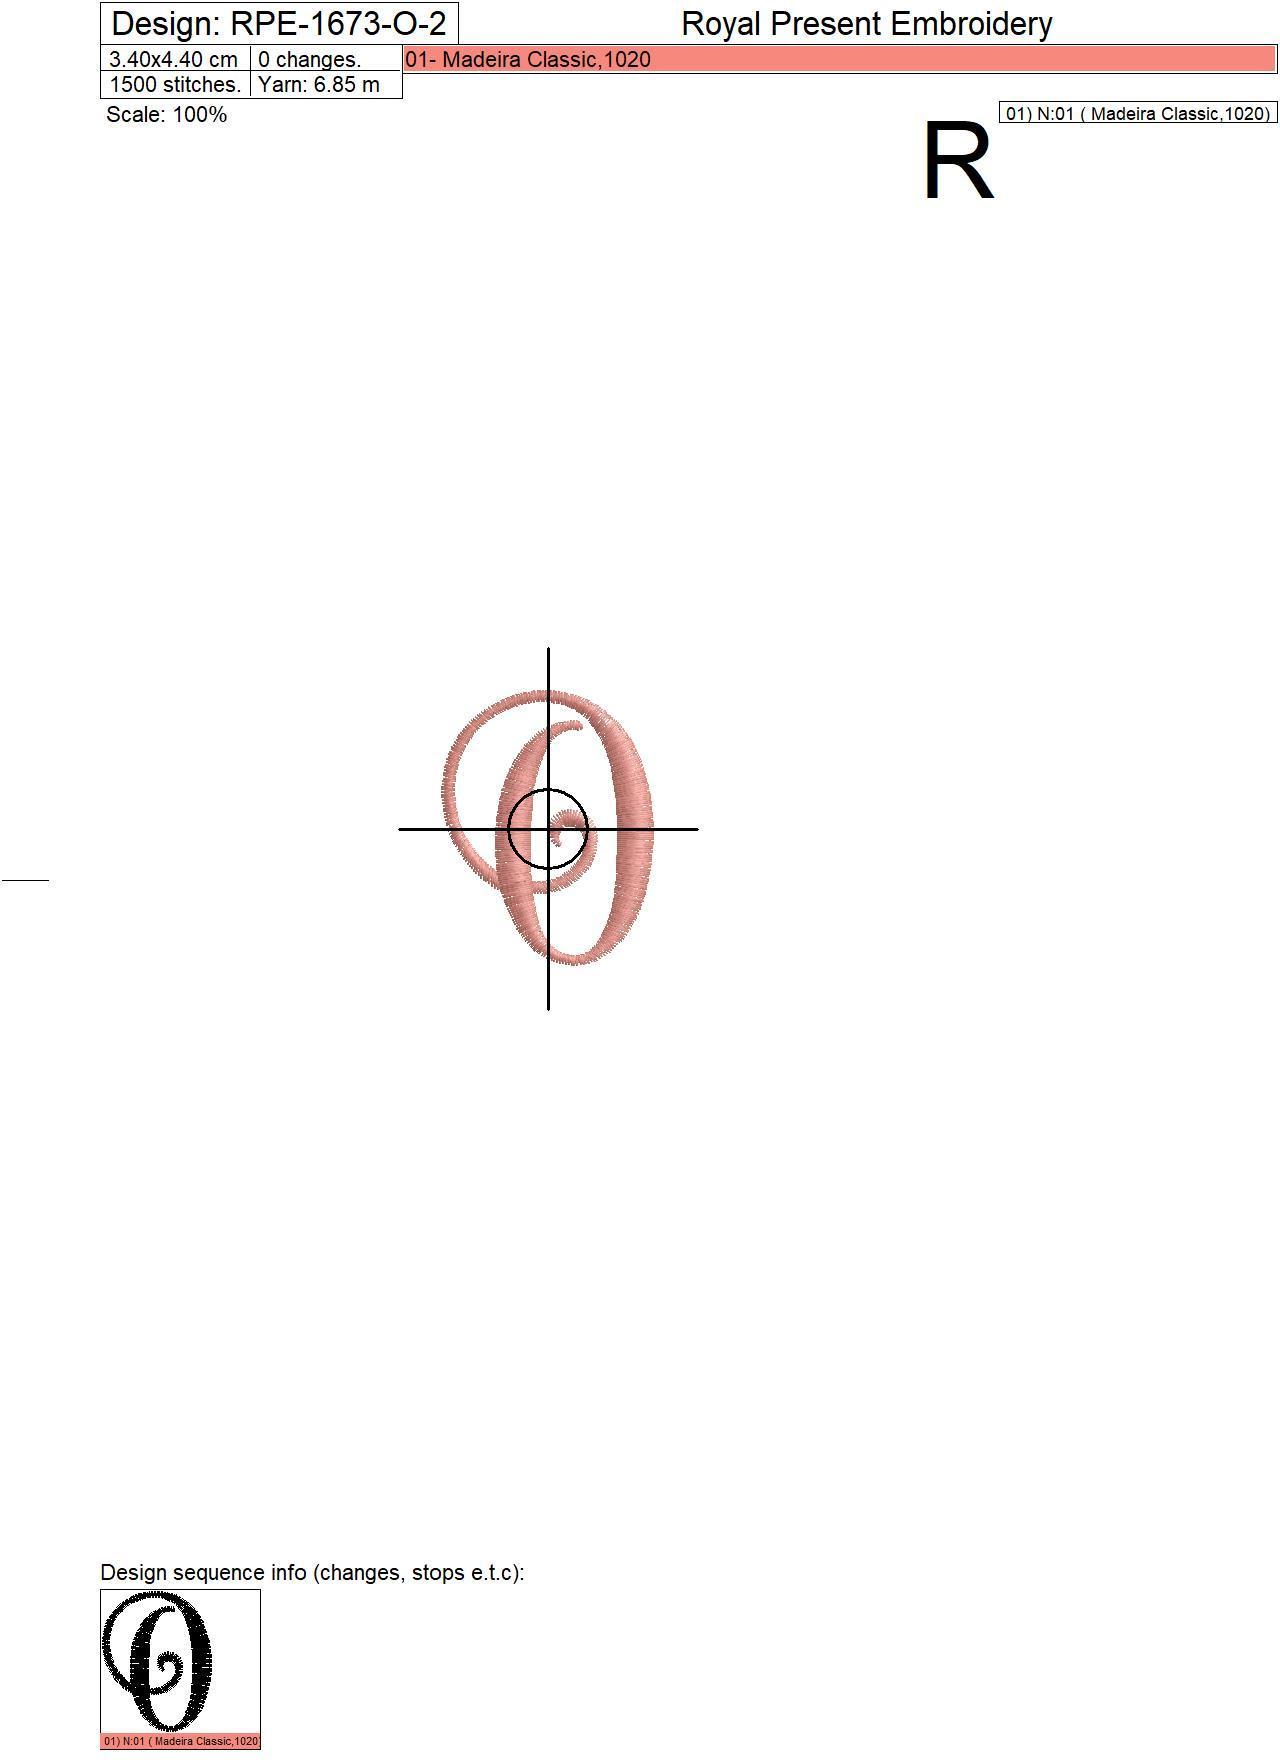 Capital Letter O Embroidery design